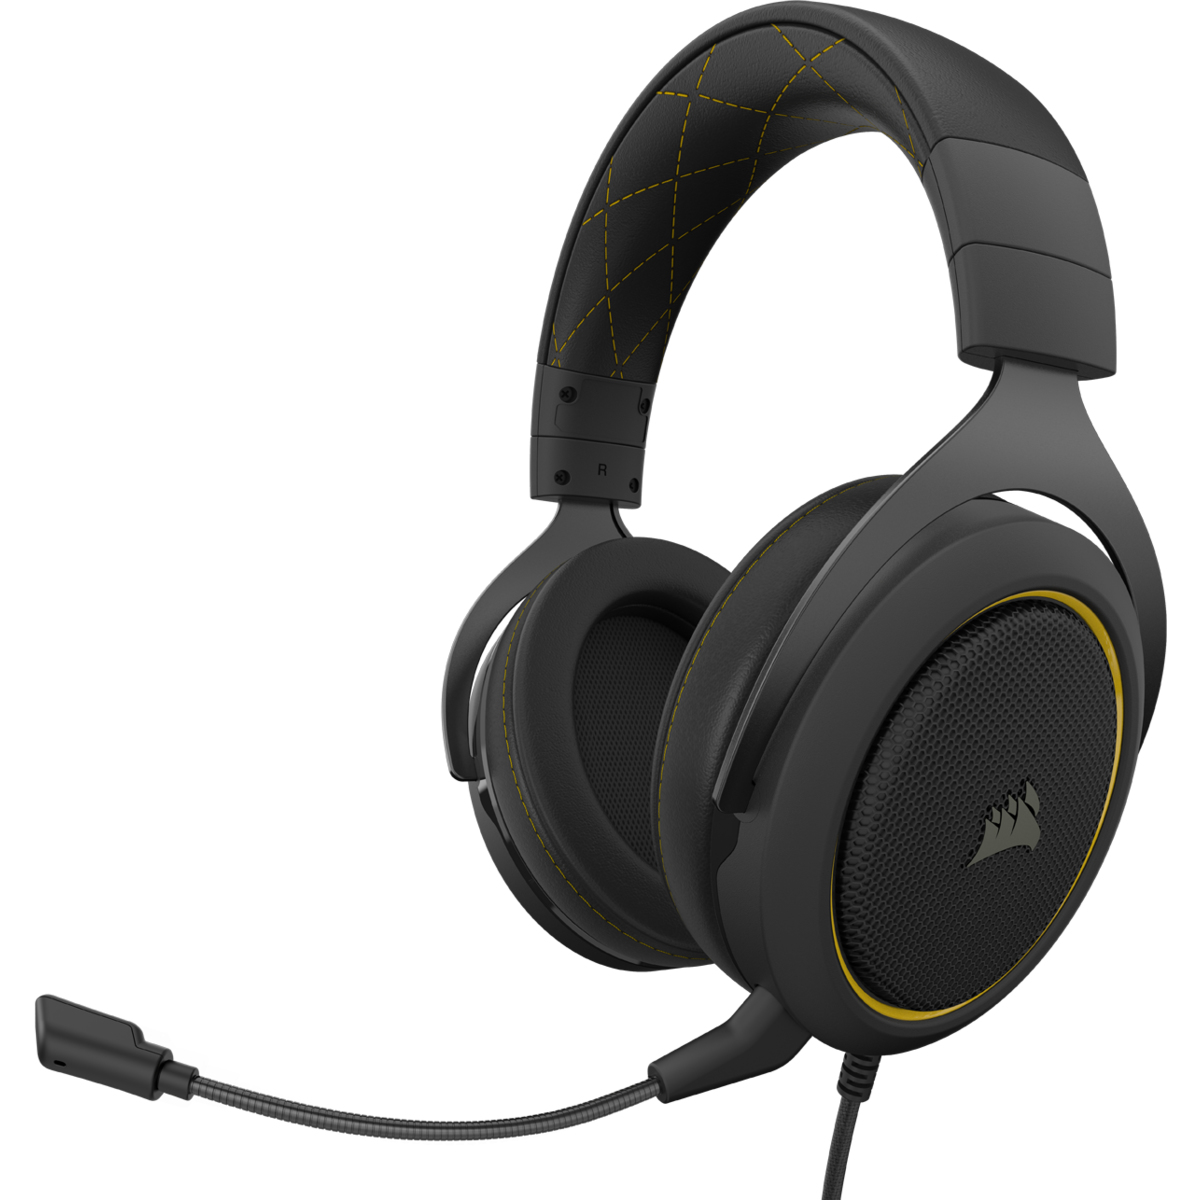 Hs60 Pro Stereo Auriculares Diadema Negro, Amarillo